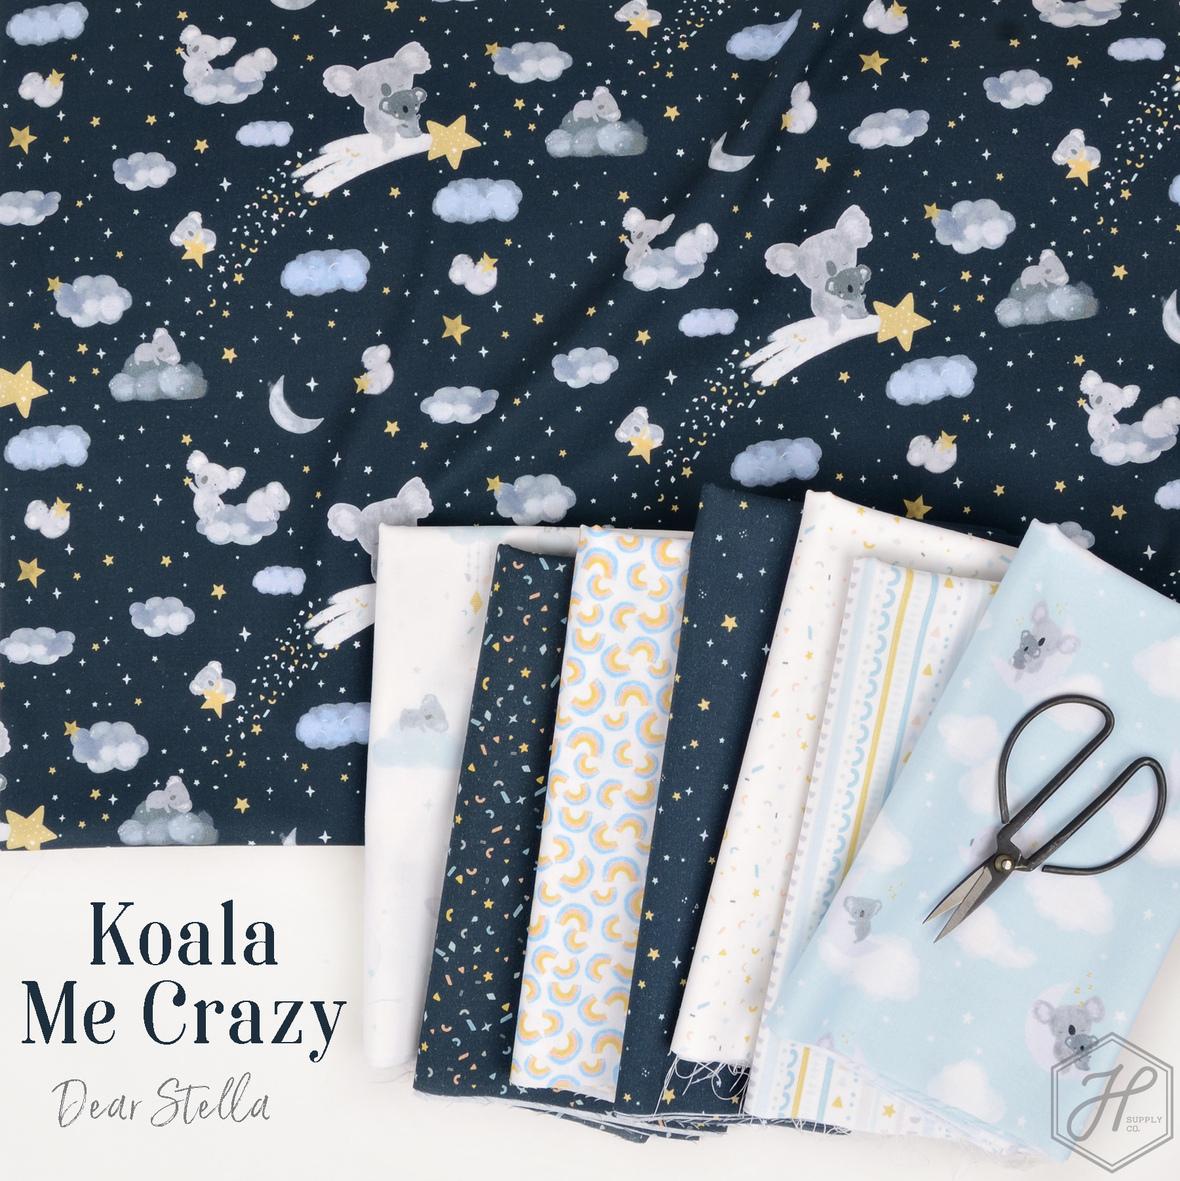 Koala Me Crazy Fabric Dear Stella at Hawhorne Supply Co